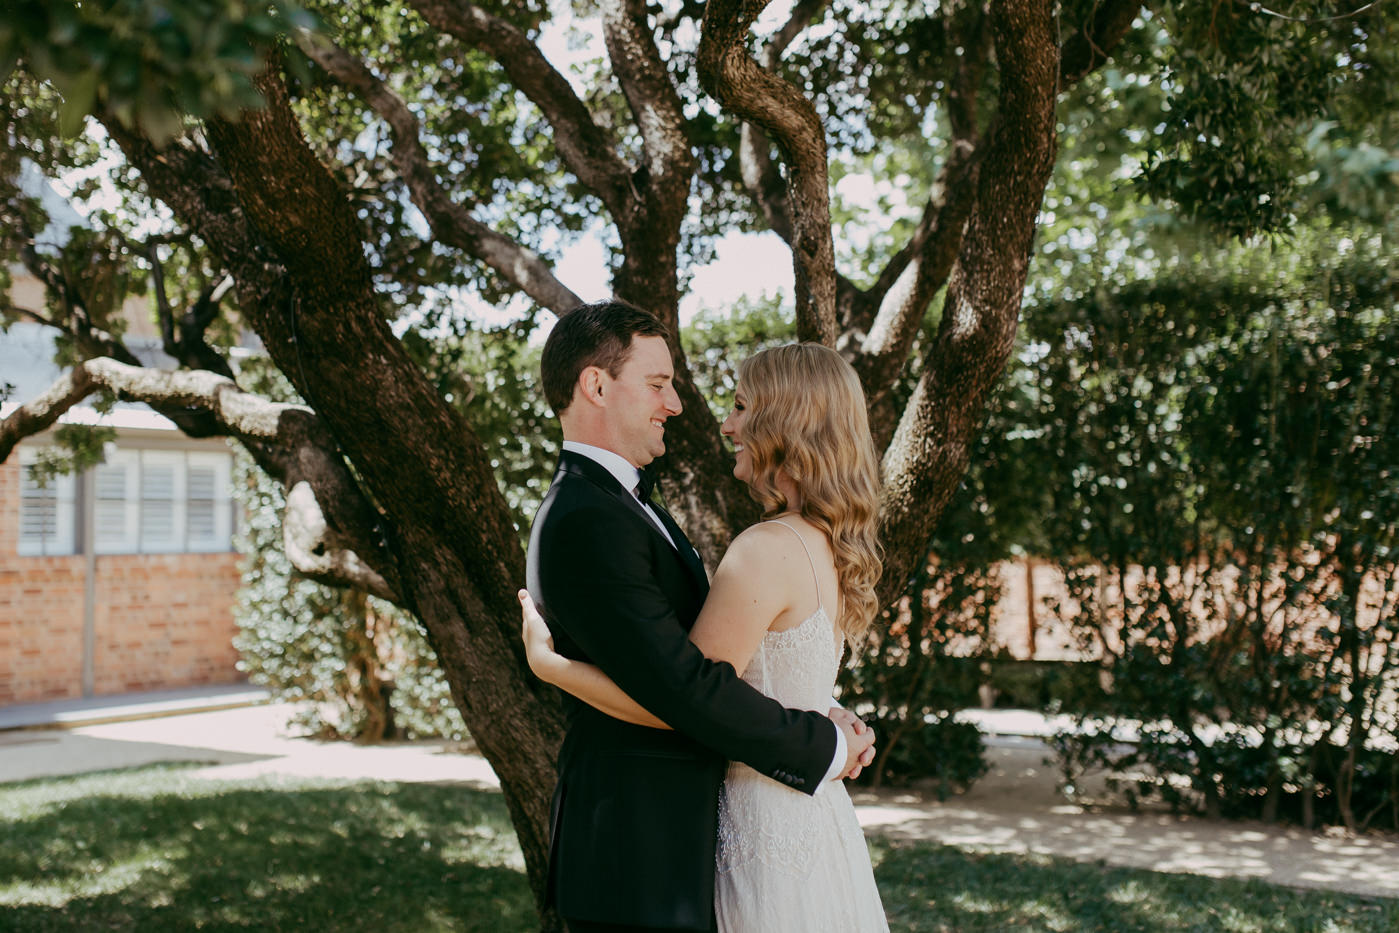 Anthony & Eliet - Wagga Wagga Wedding - Country NSW - Samantha Heather Photography-41.jpg